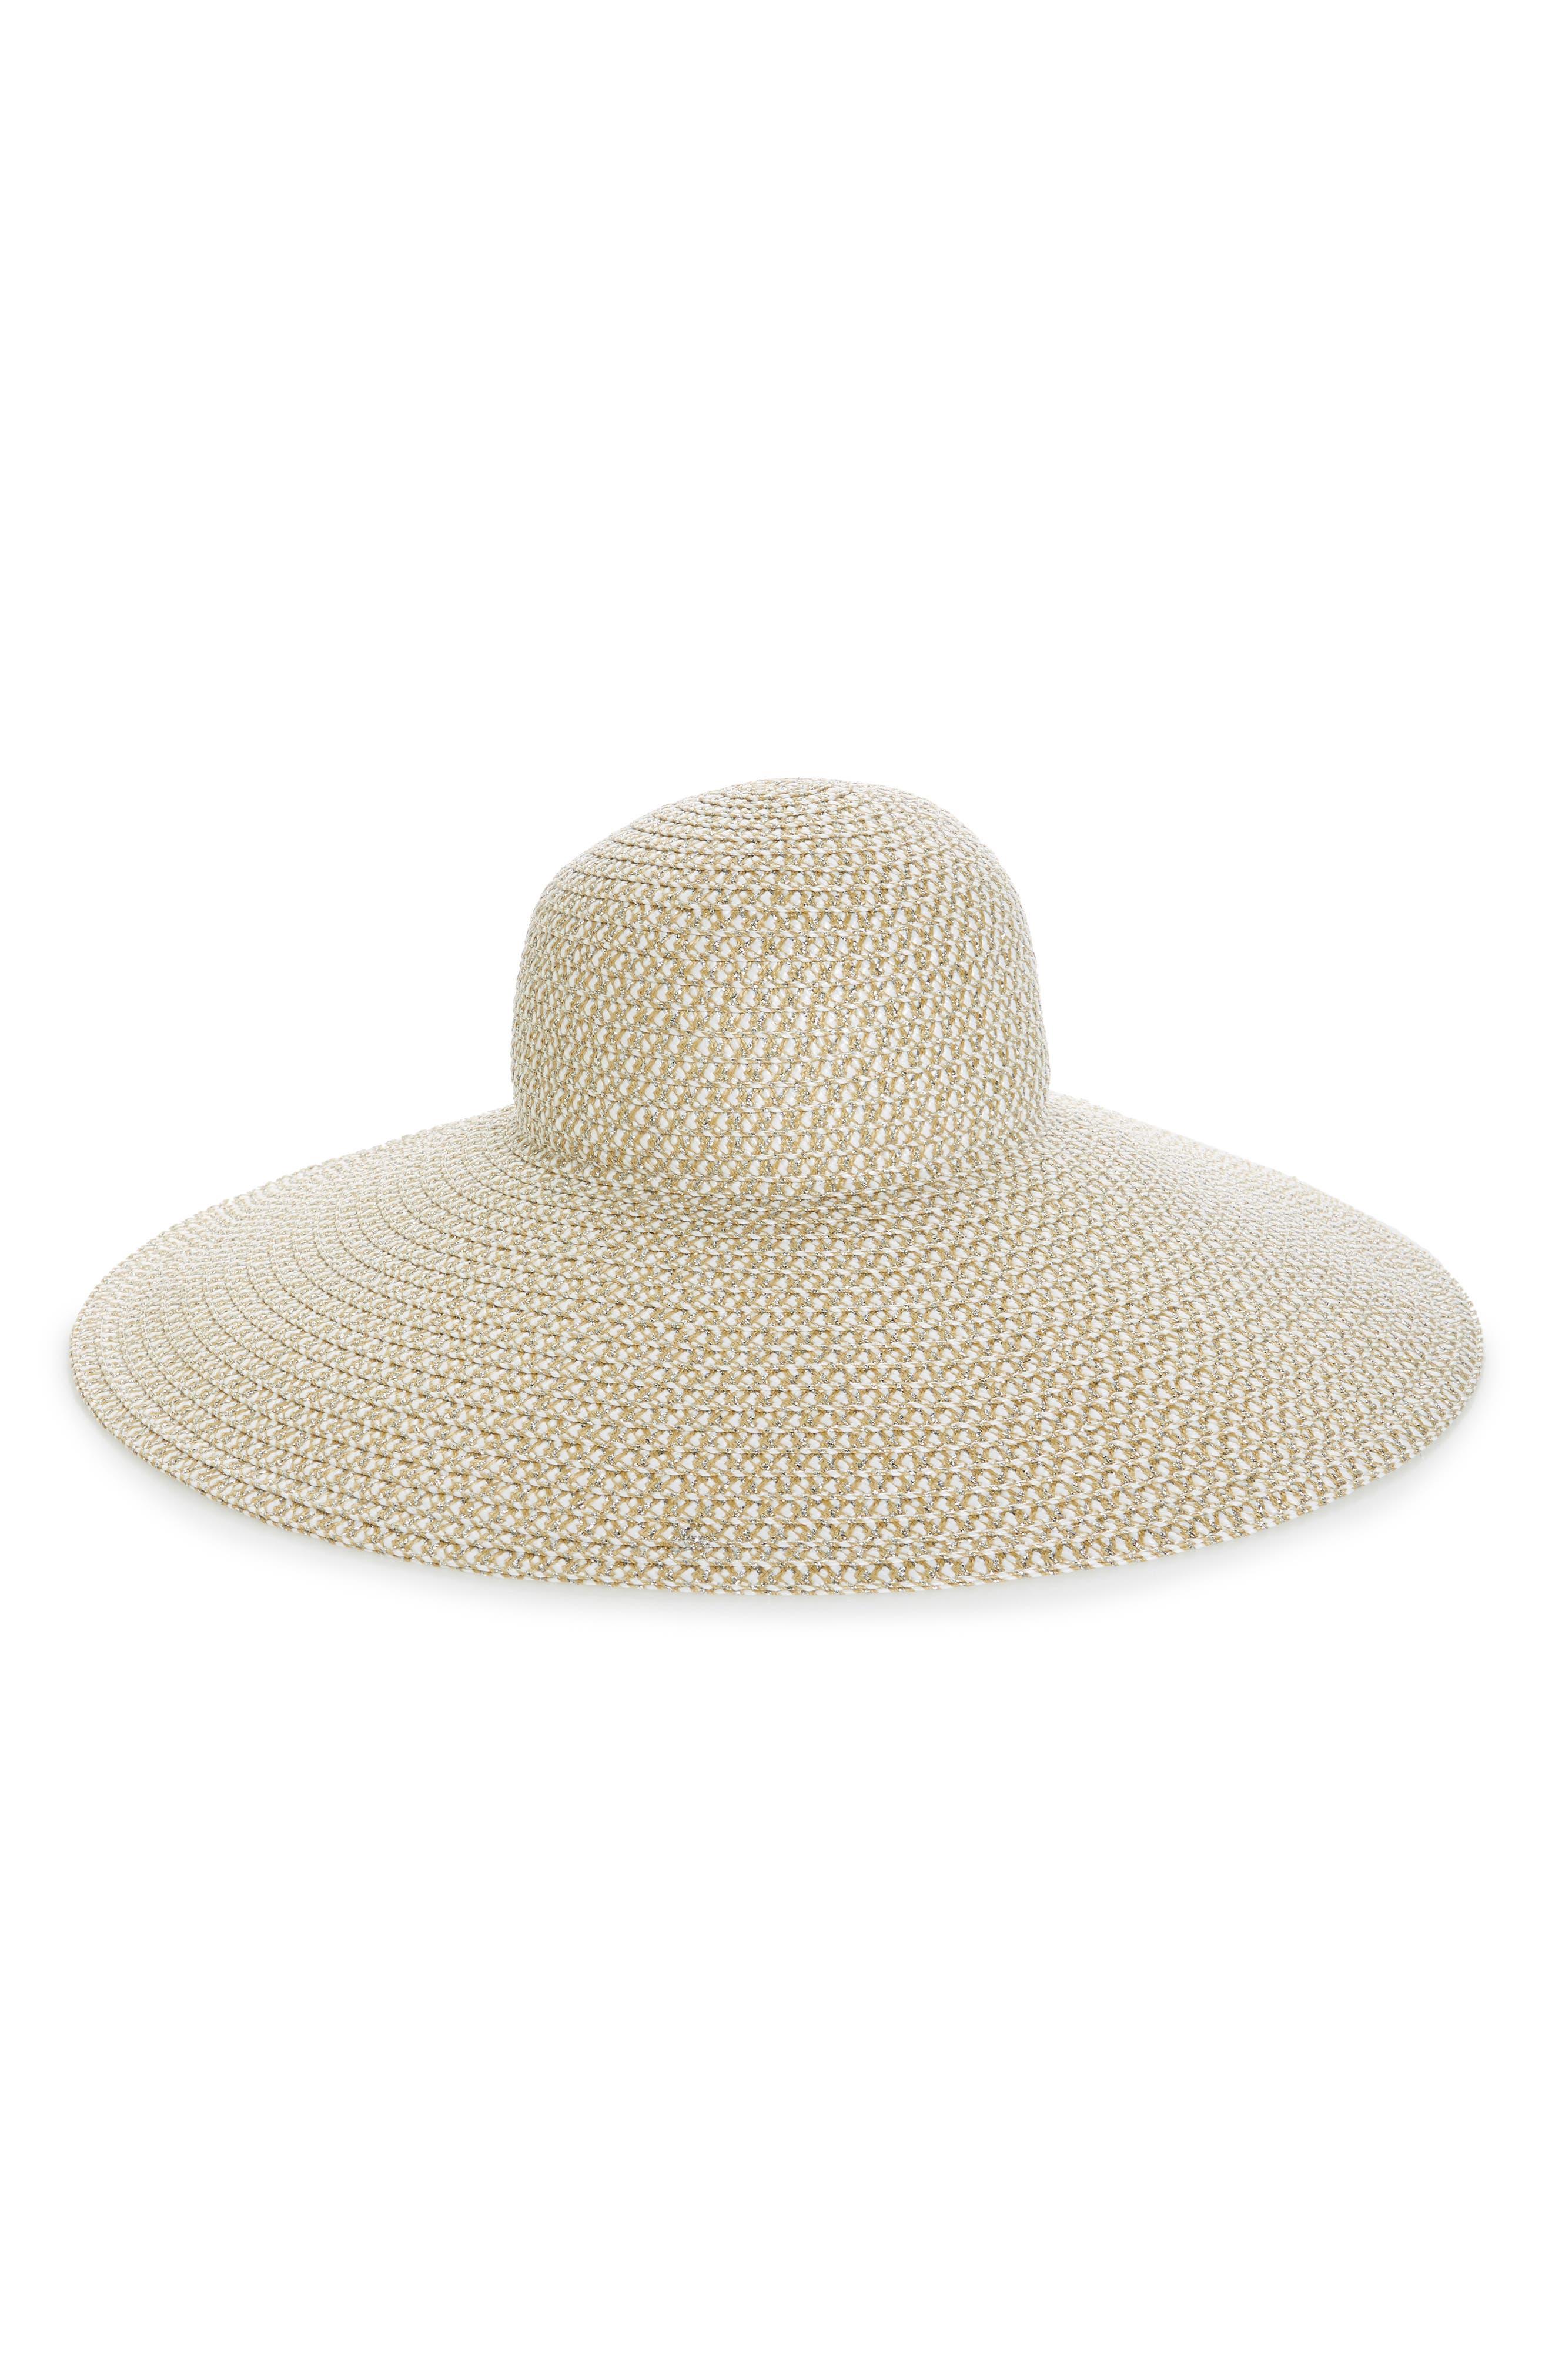 ERIC JAVITS Floppy Straw Hat, Main, color, ICE